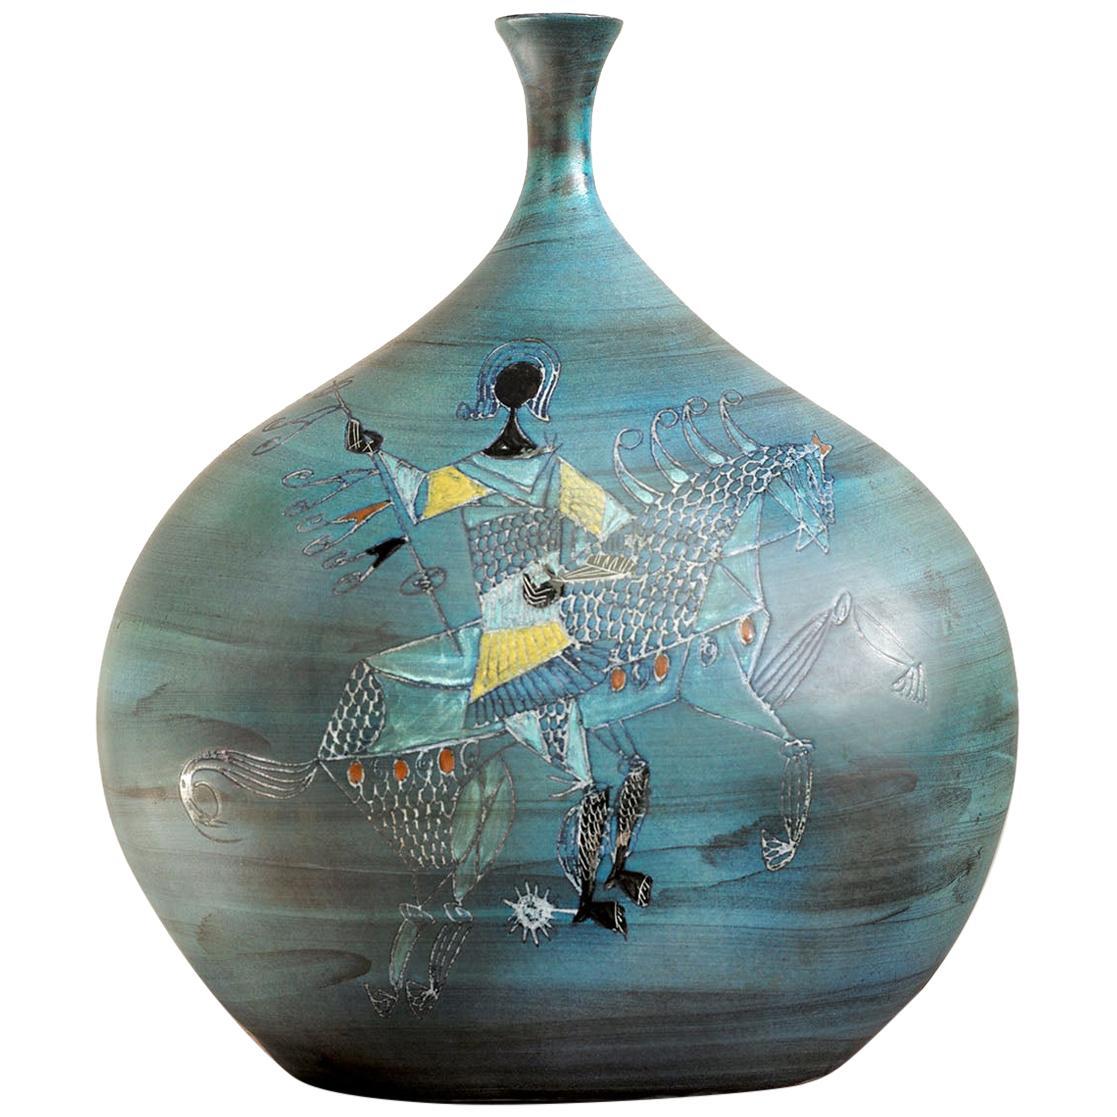 Jean de Lespinasse, Large Vase with Rider Decoration, France, 1960